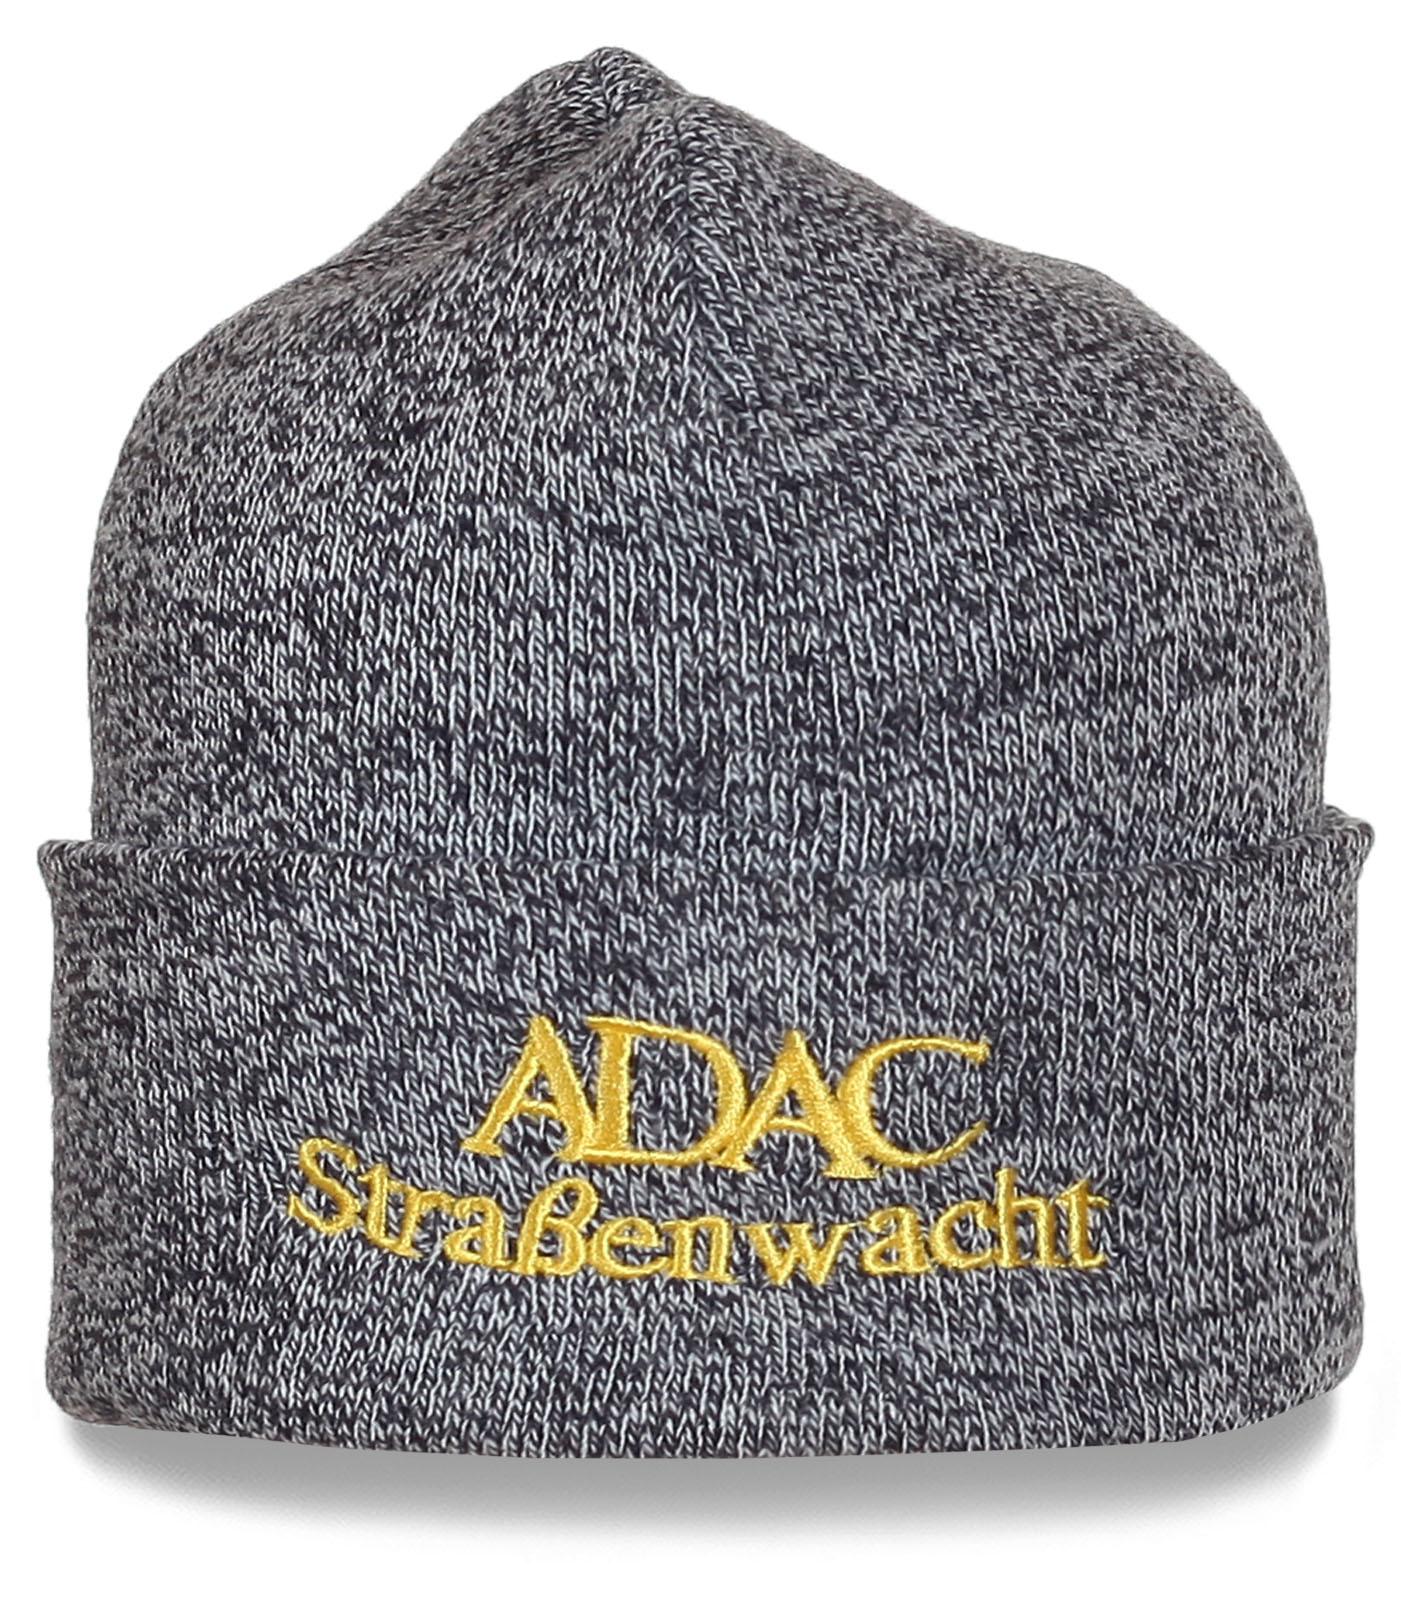 Серая шапка Adac Strabenwacht